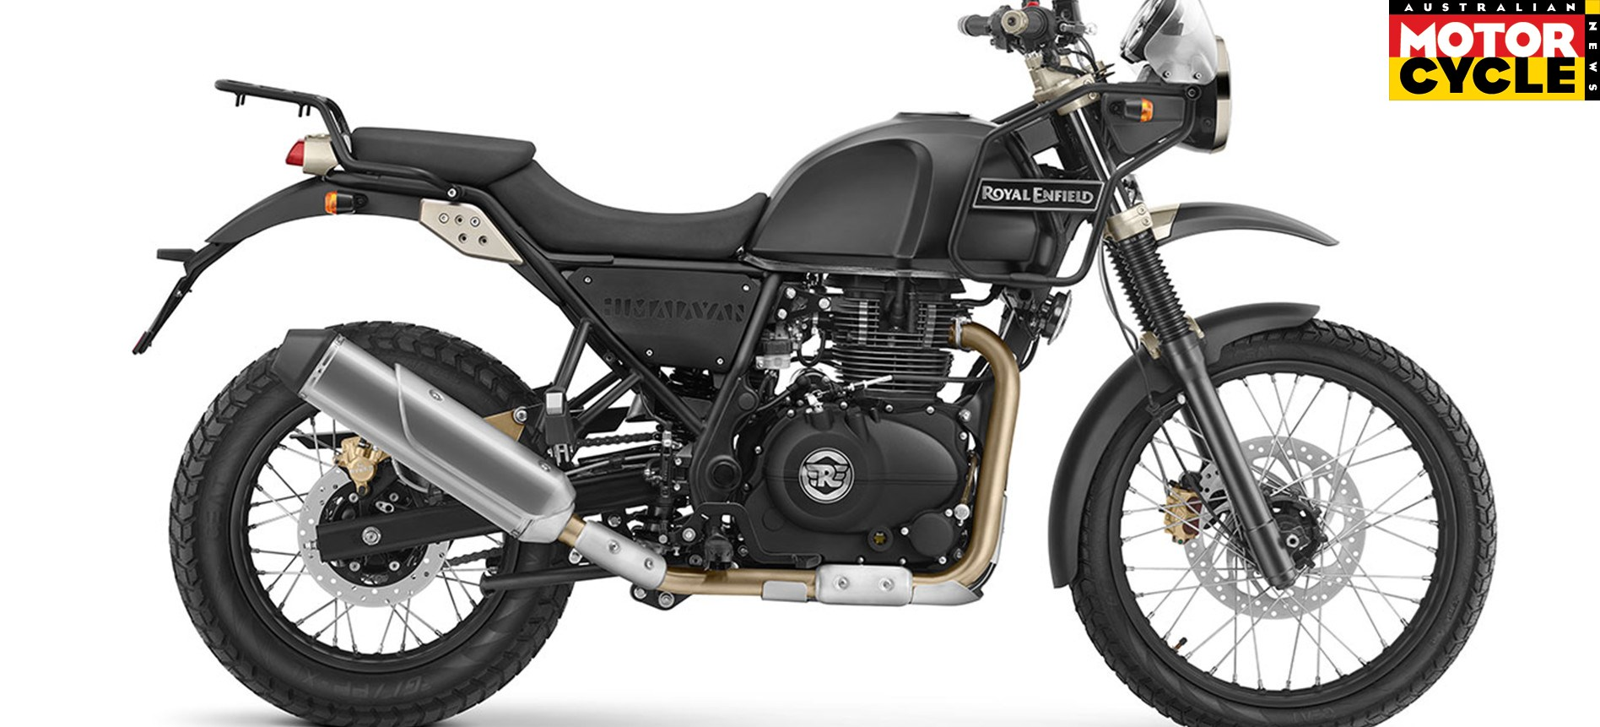 Royal Enfield Himalayan Revealed - Australian Motorcycle News